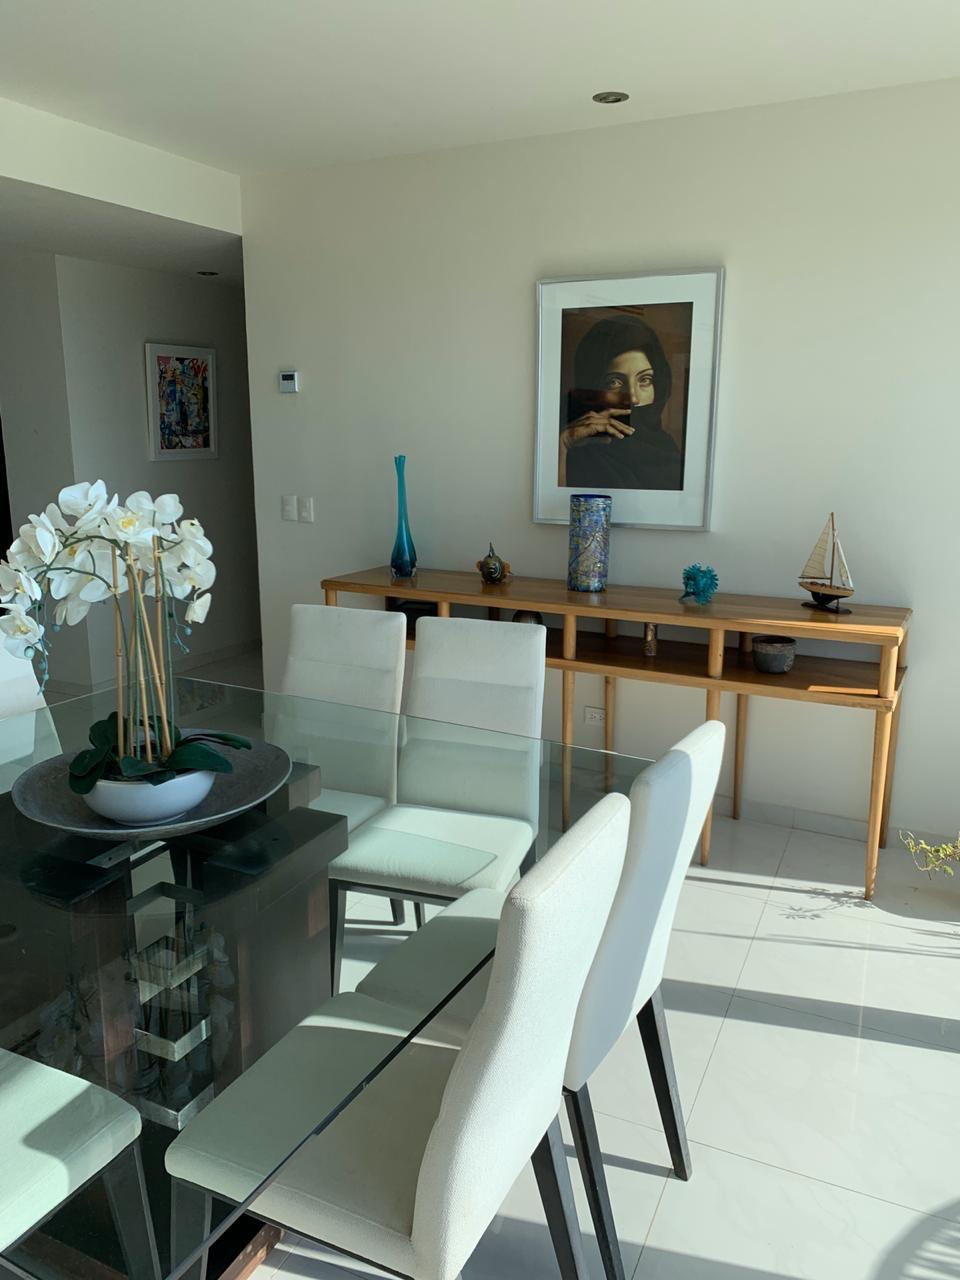 Departamento en Venta en Residencial Palmeras en Cancún Quintana Roo CP 77500